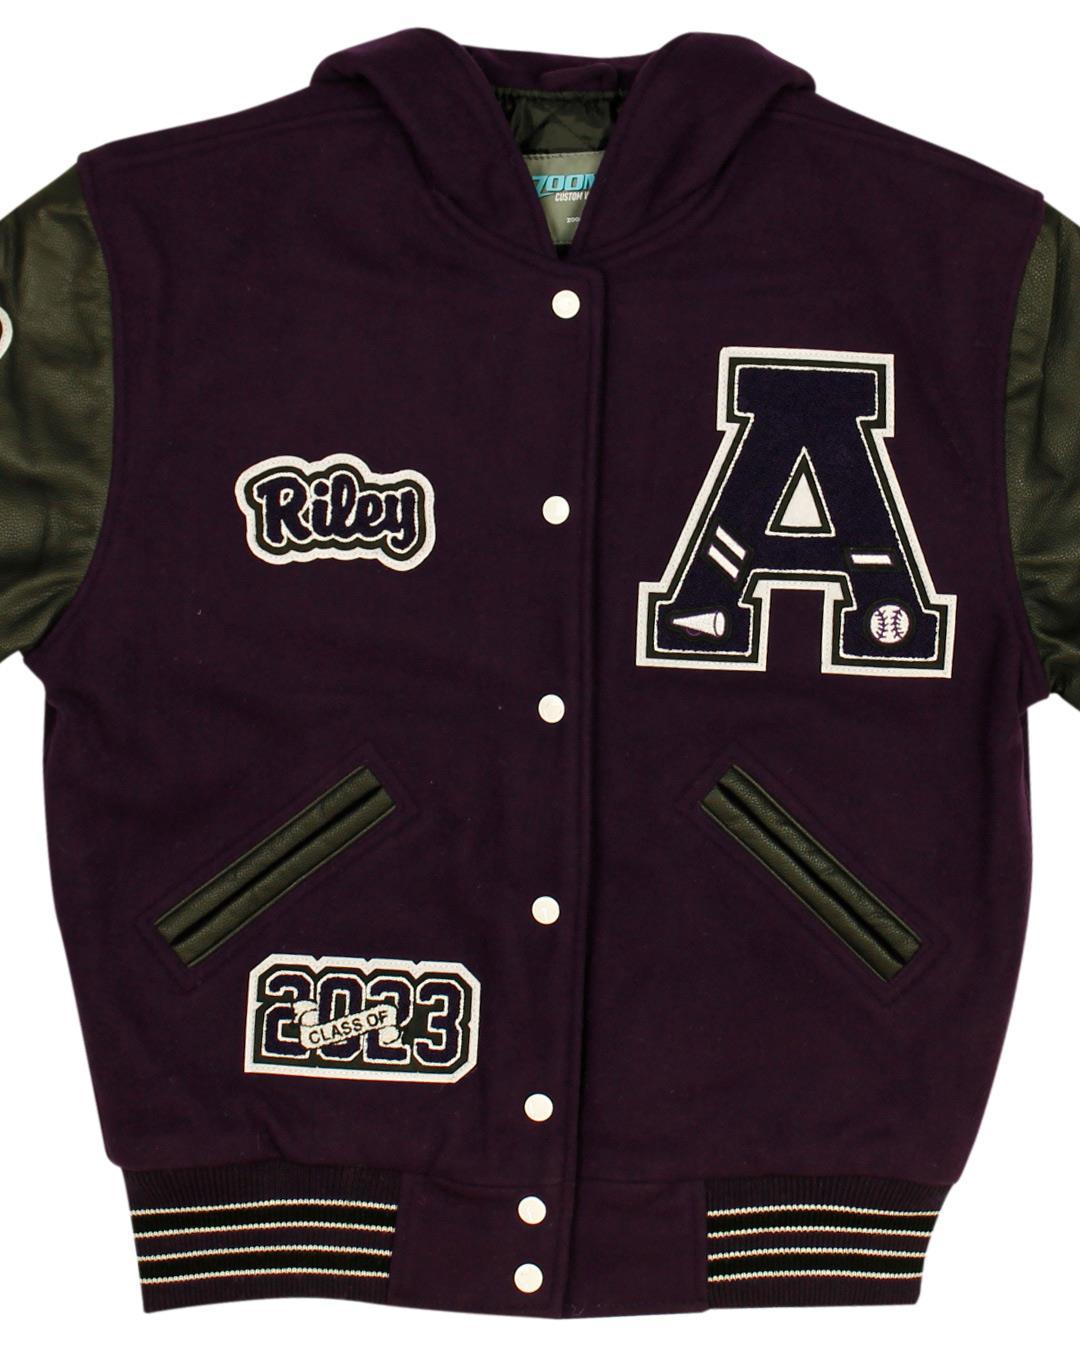 Anacortes High School Letterman Jacket, Anacortes WA - Front